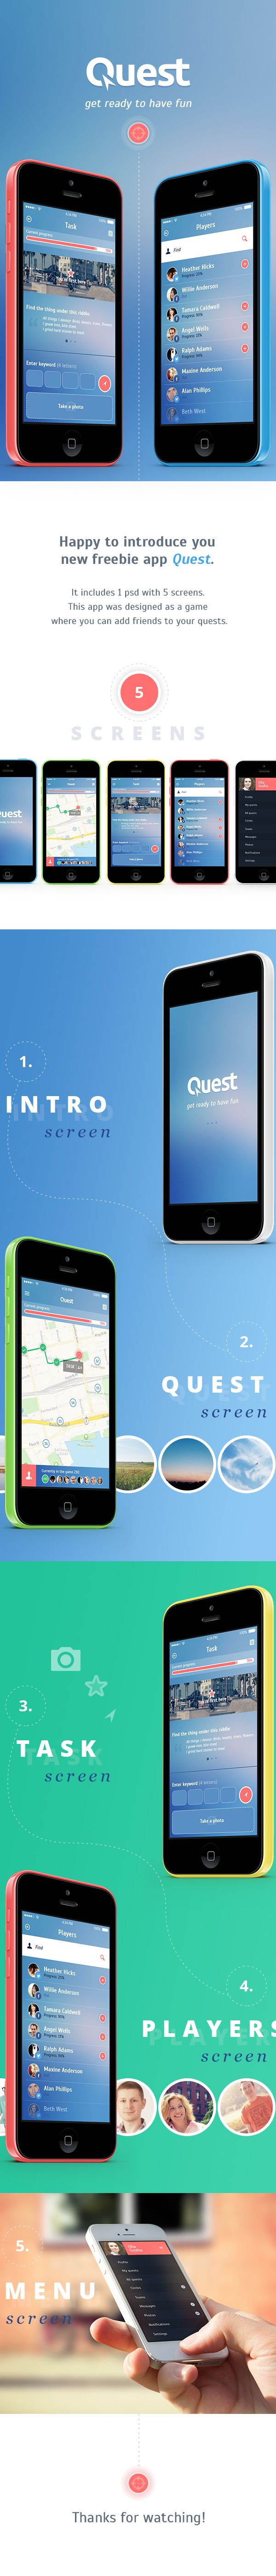 Quest. Free iOS7 App on Behance